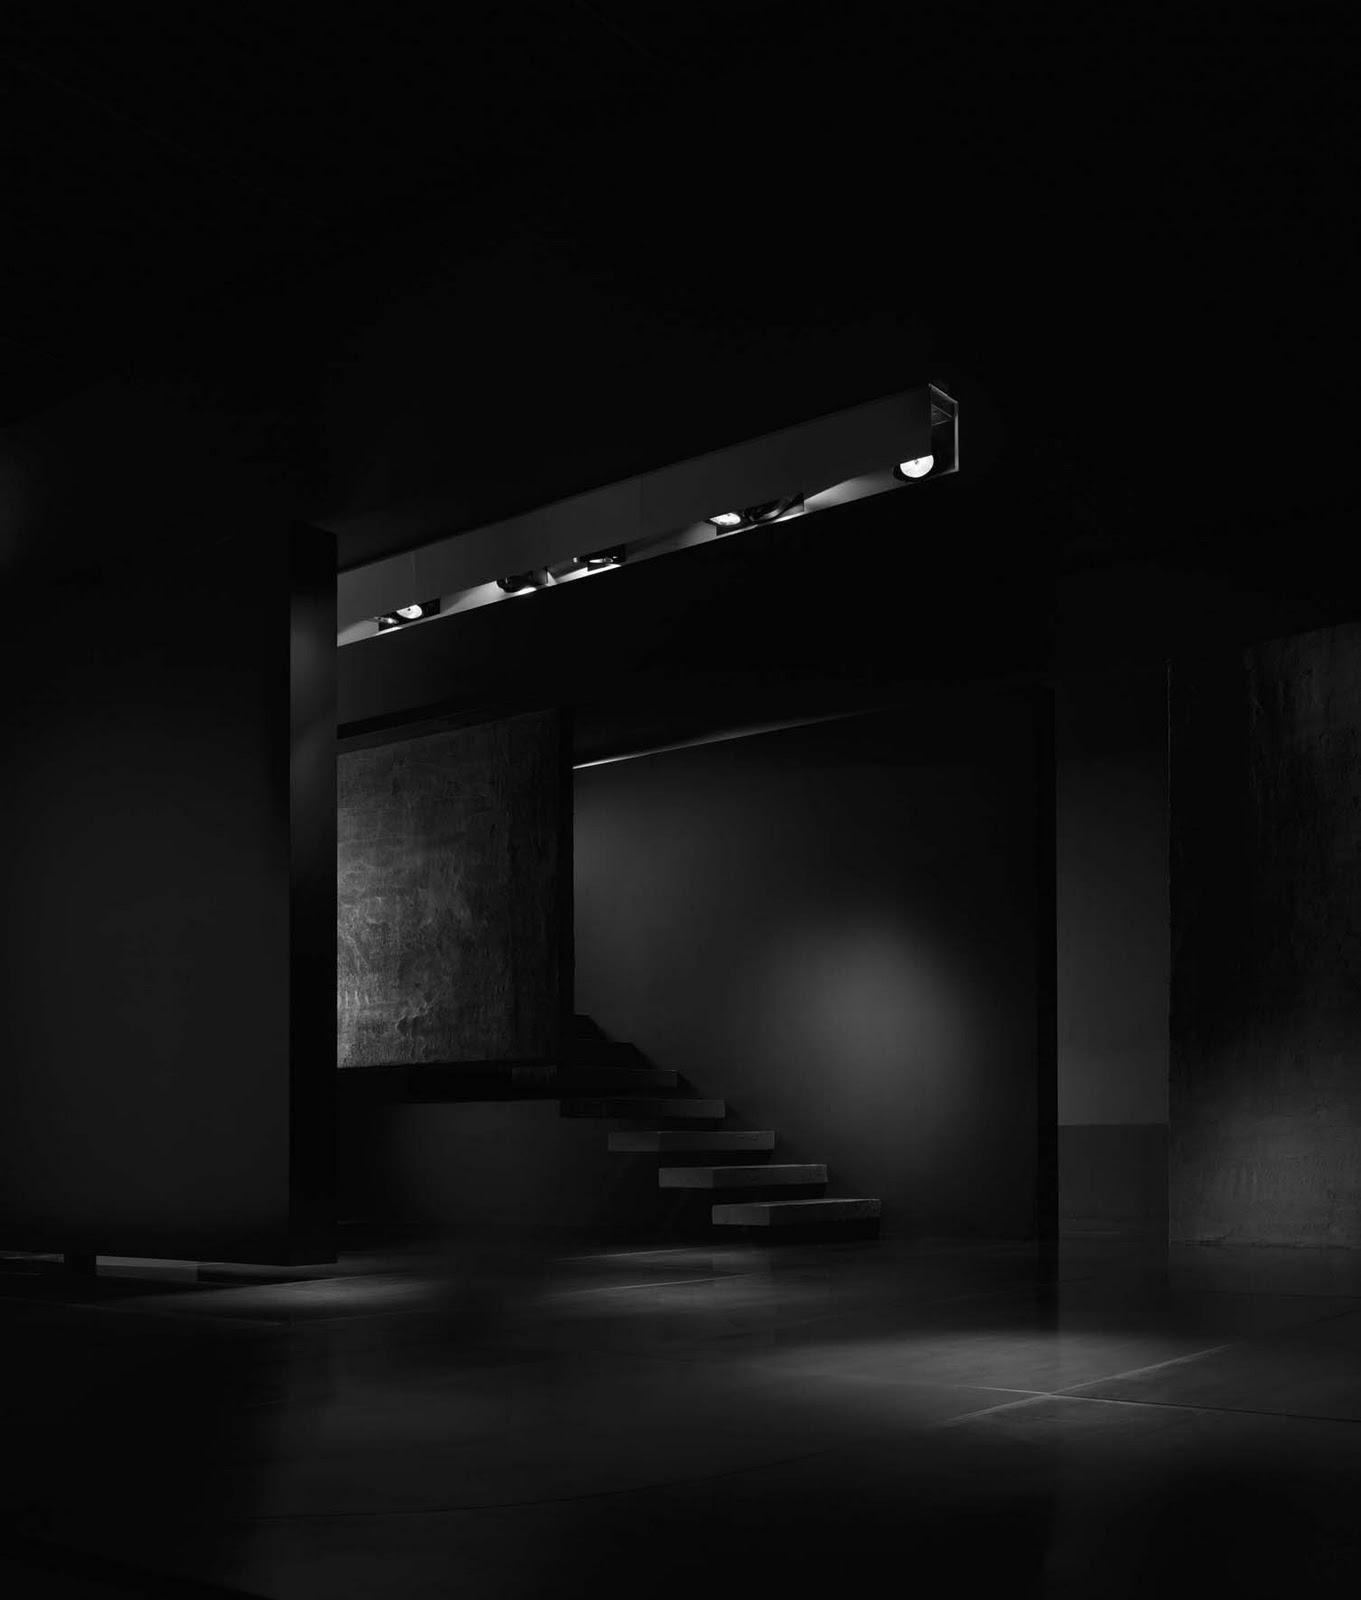 Sistema Illuminazione Architetturale HORTO Design Hangar